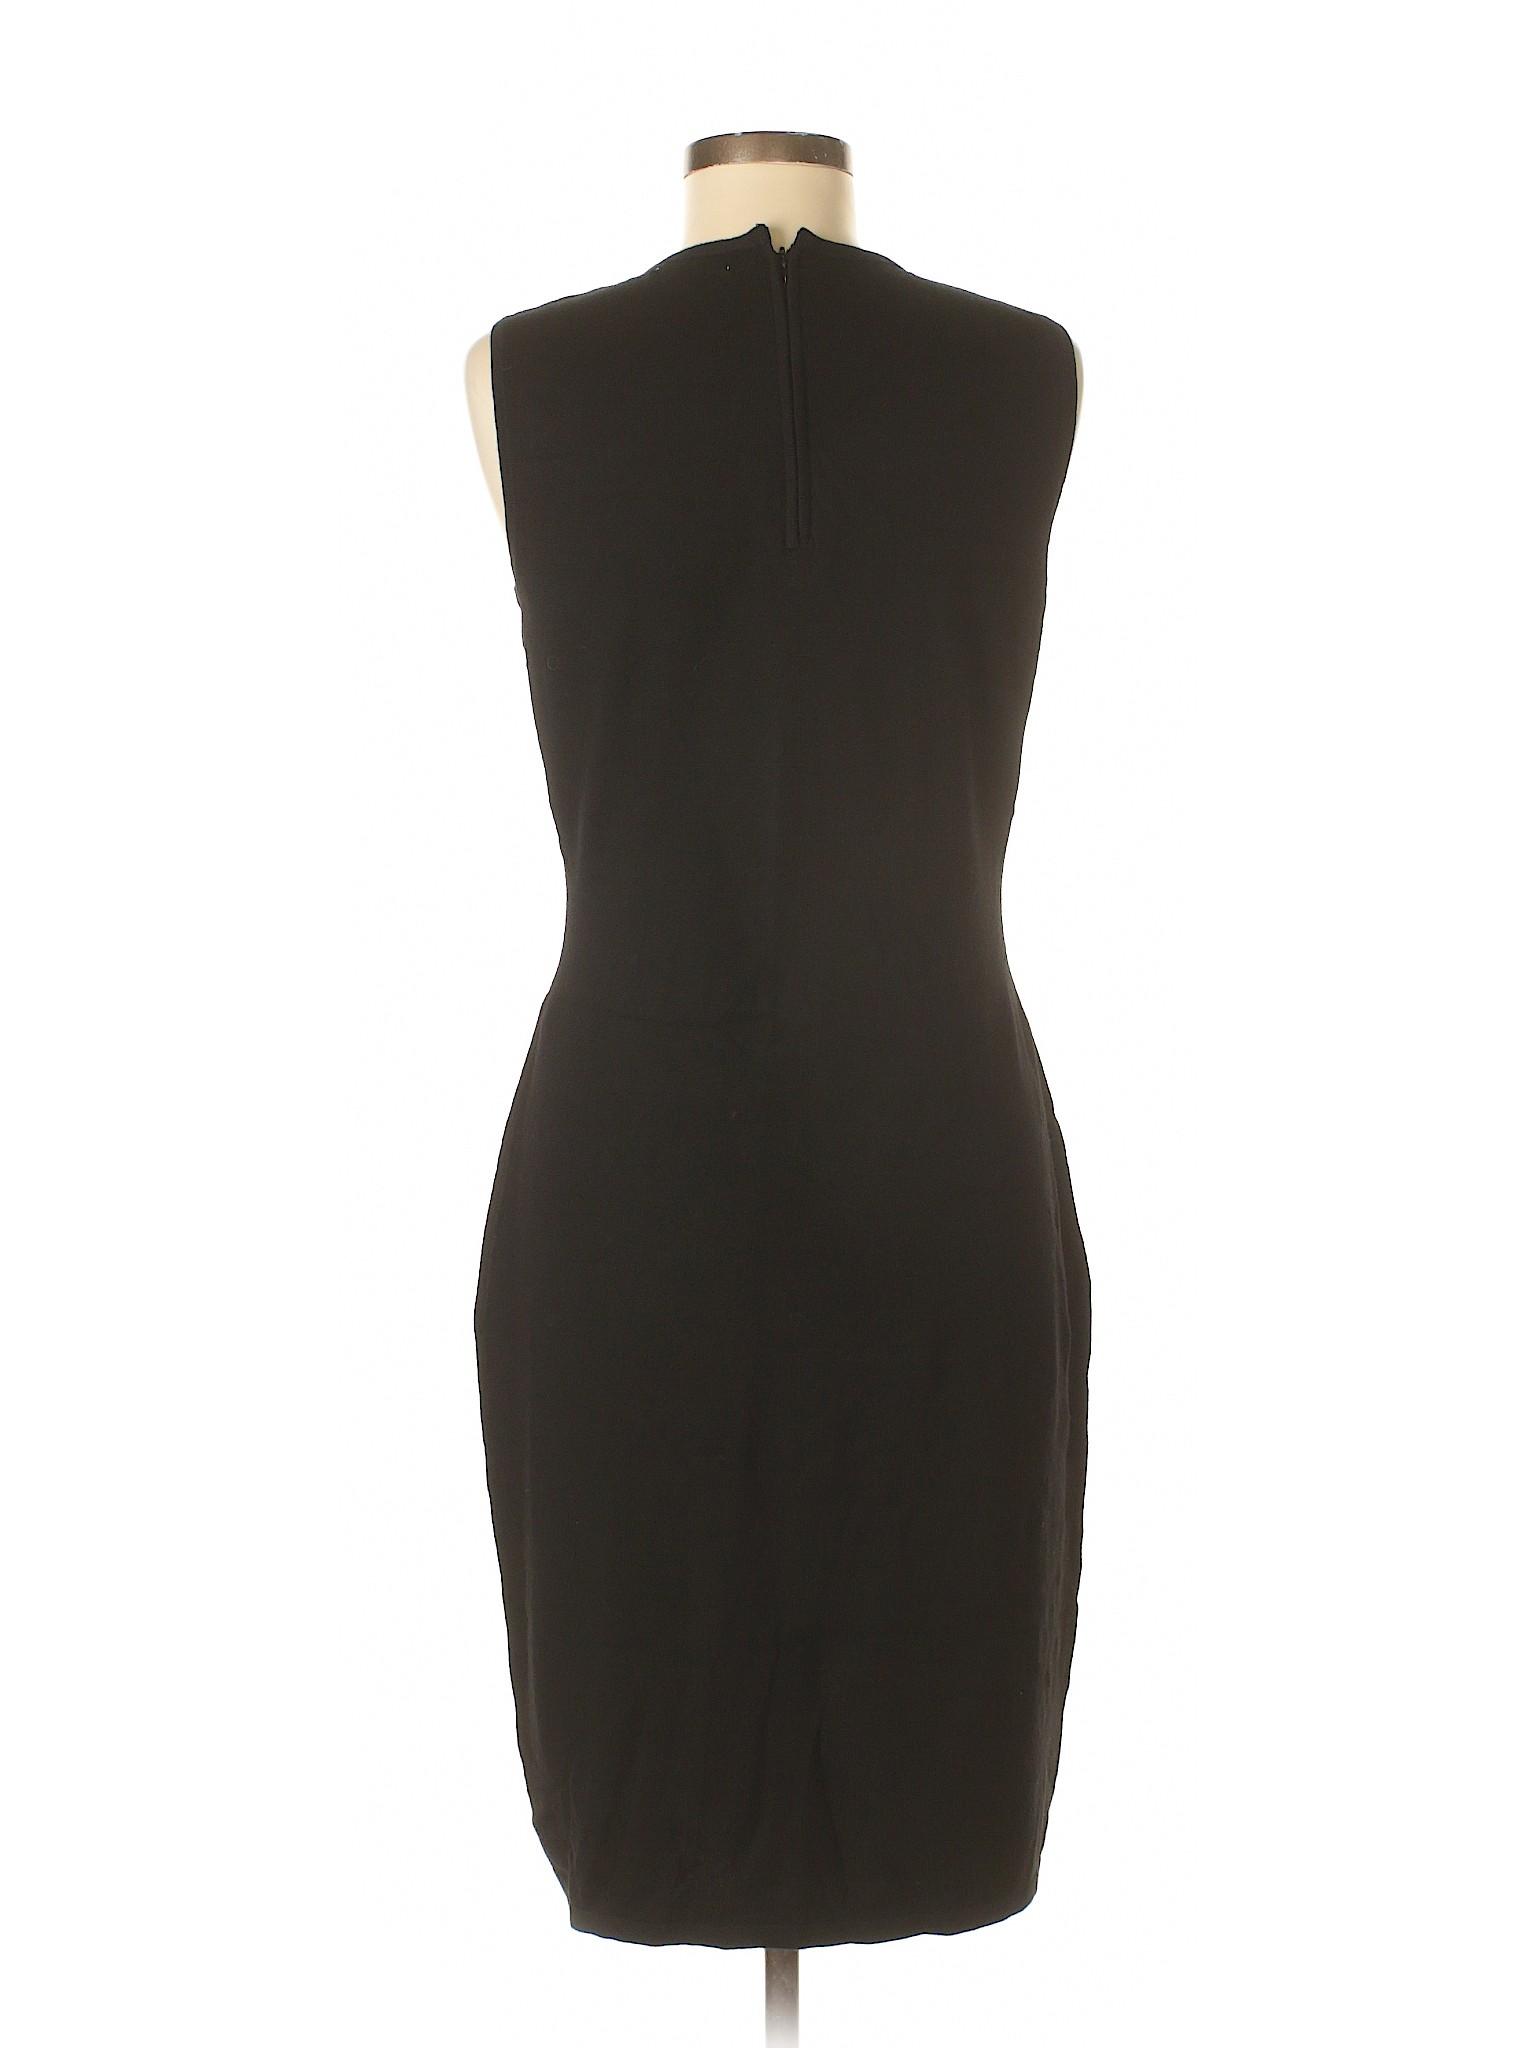 Casual winter Dress Boutique Klein Calvin RwAxqUq8CF